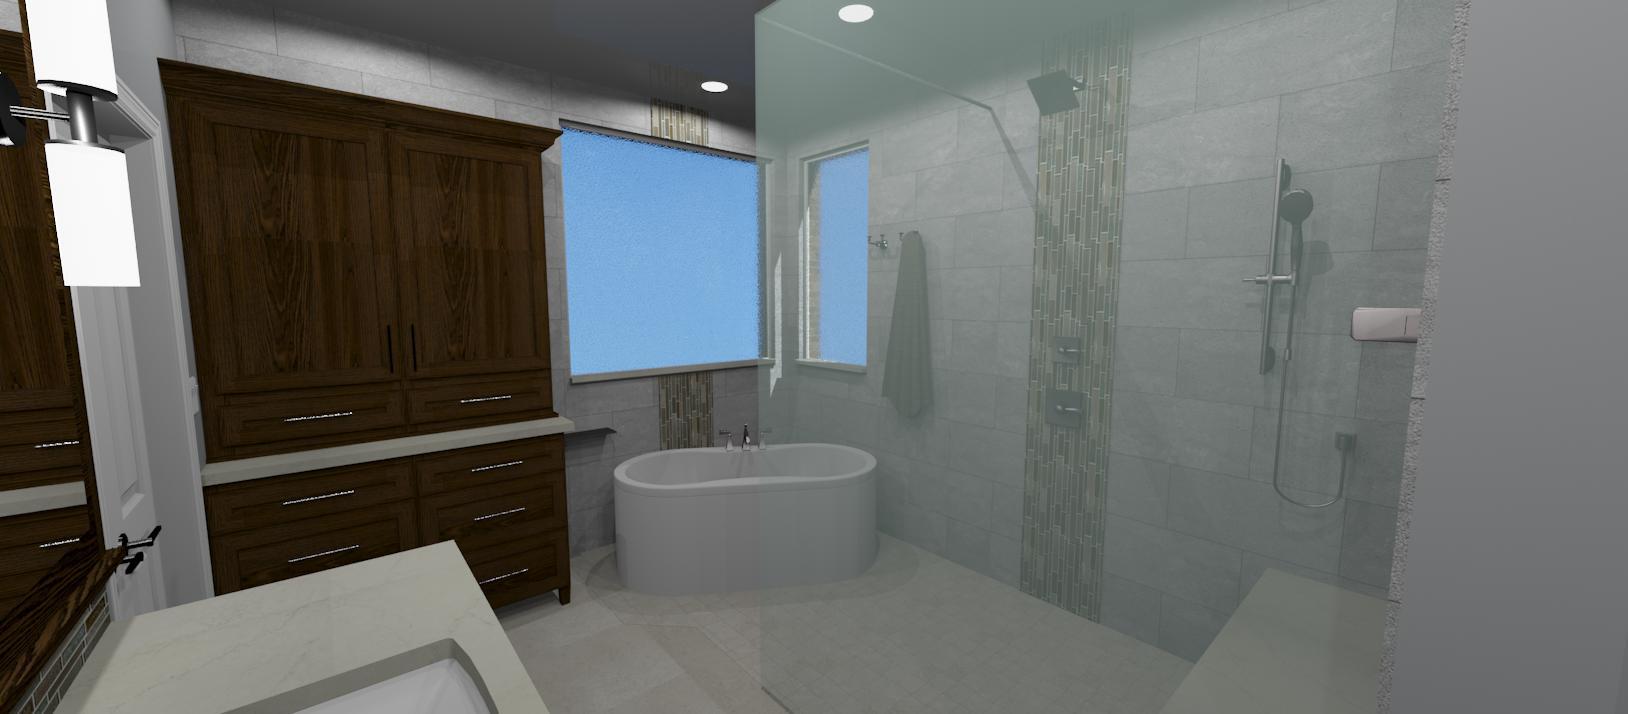 3D bathroom remodel design rendering